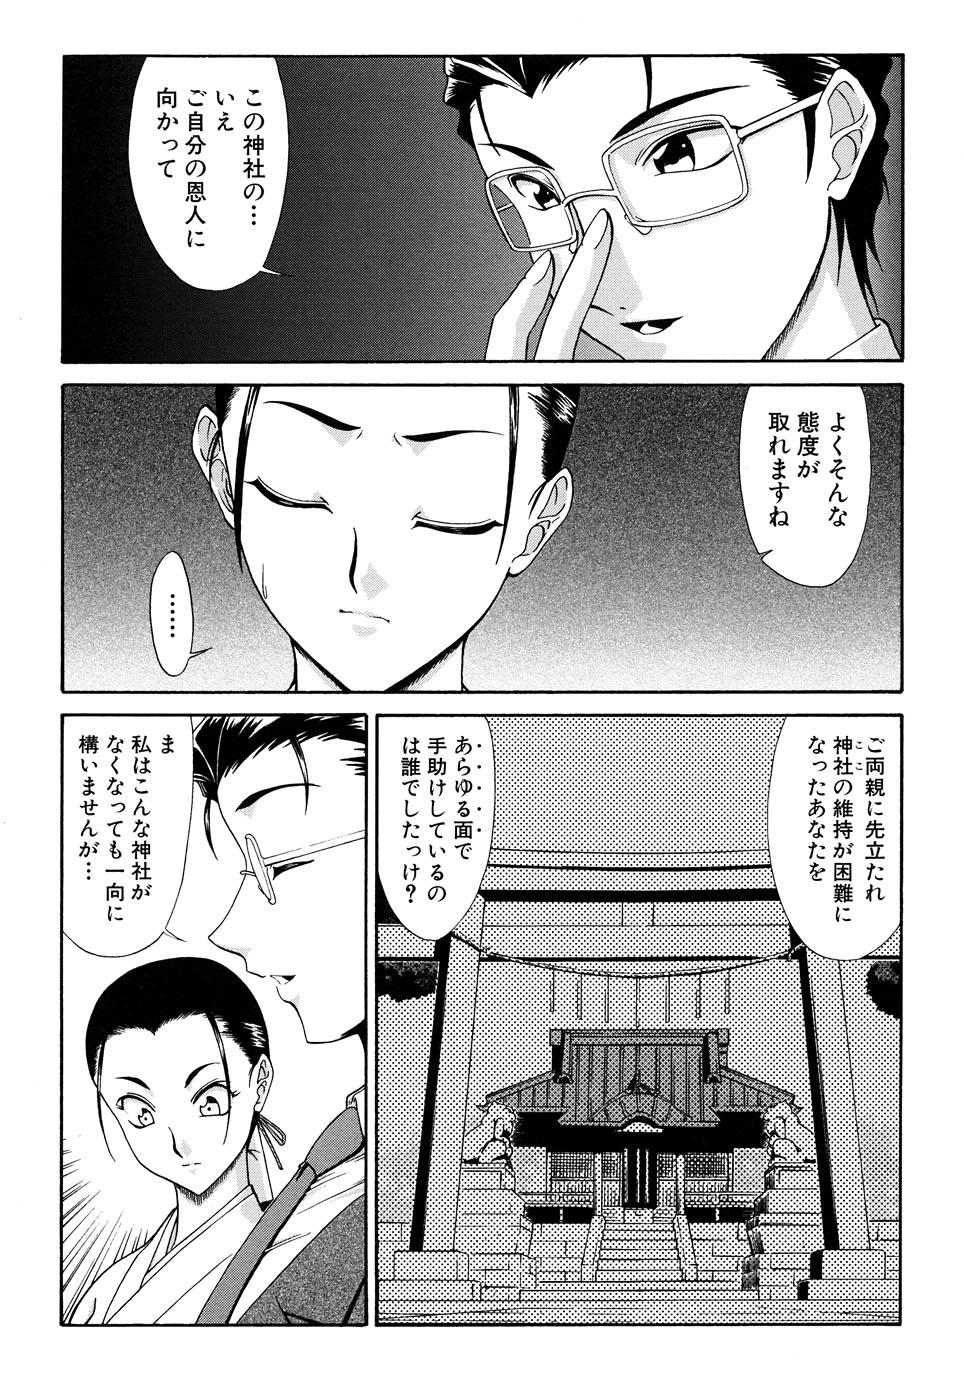 Fechikko VS Series ROUND.2 Miko San VS Maid San 12